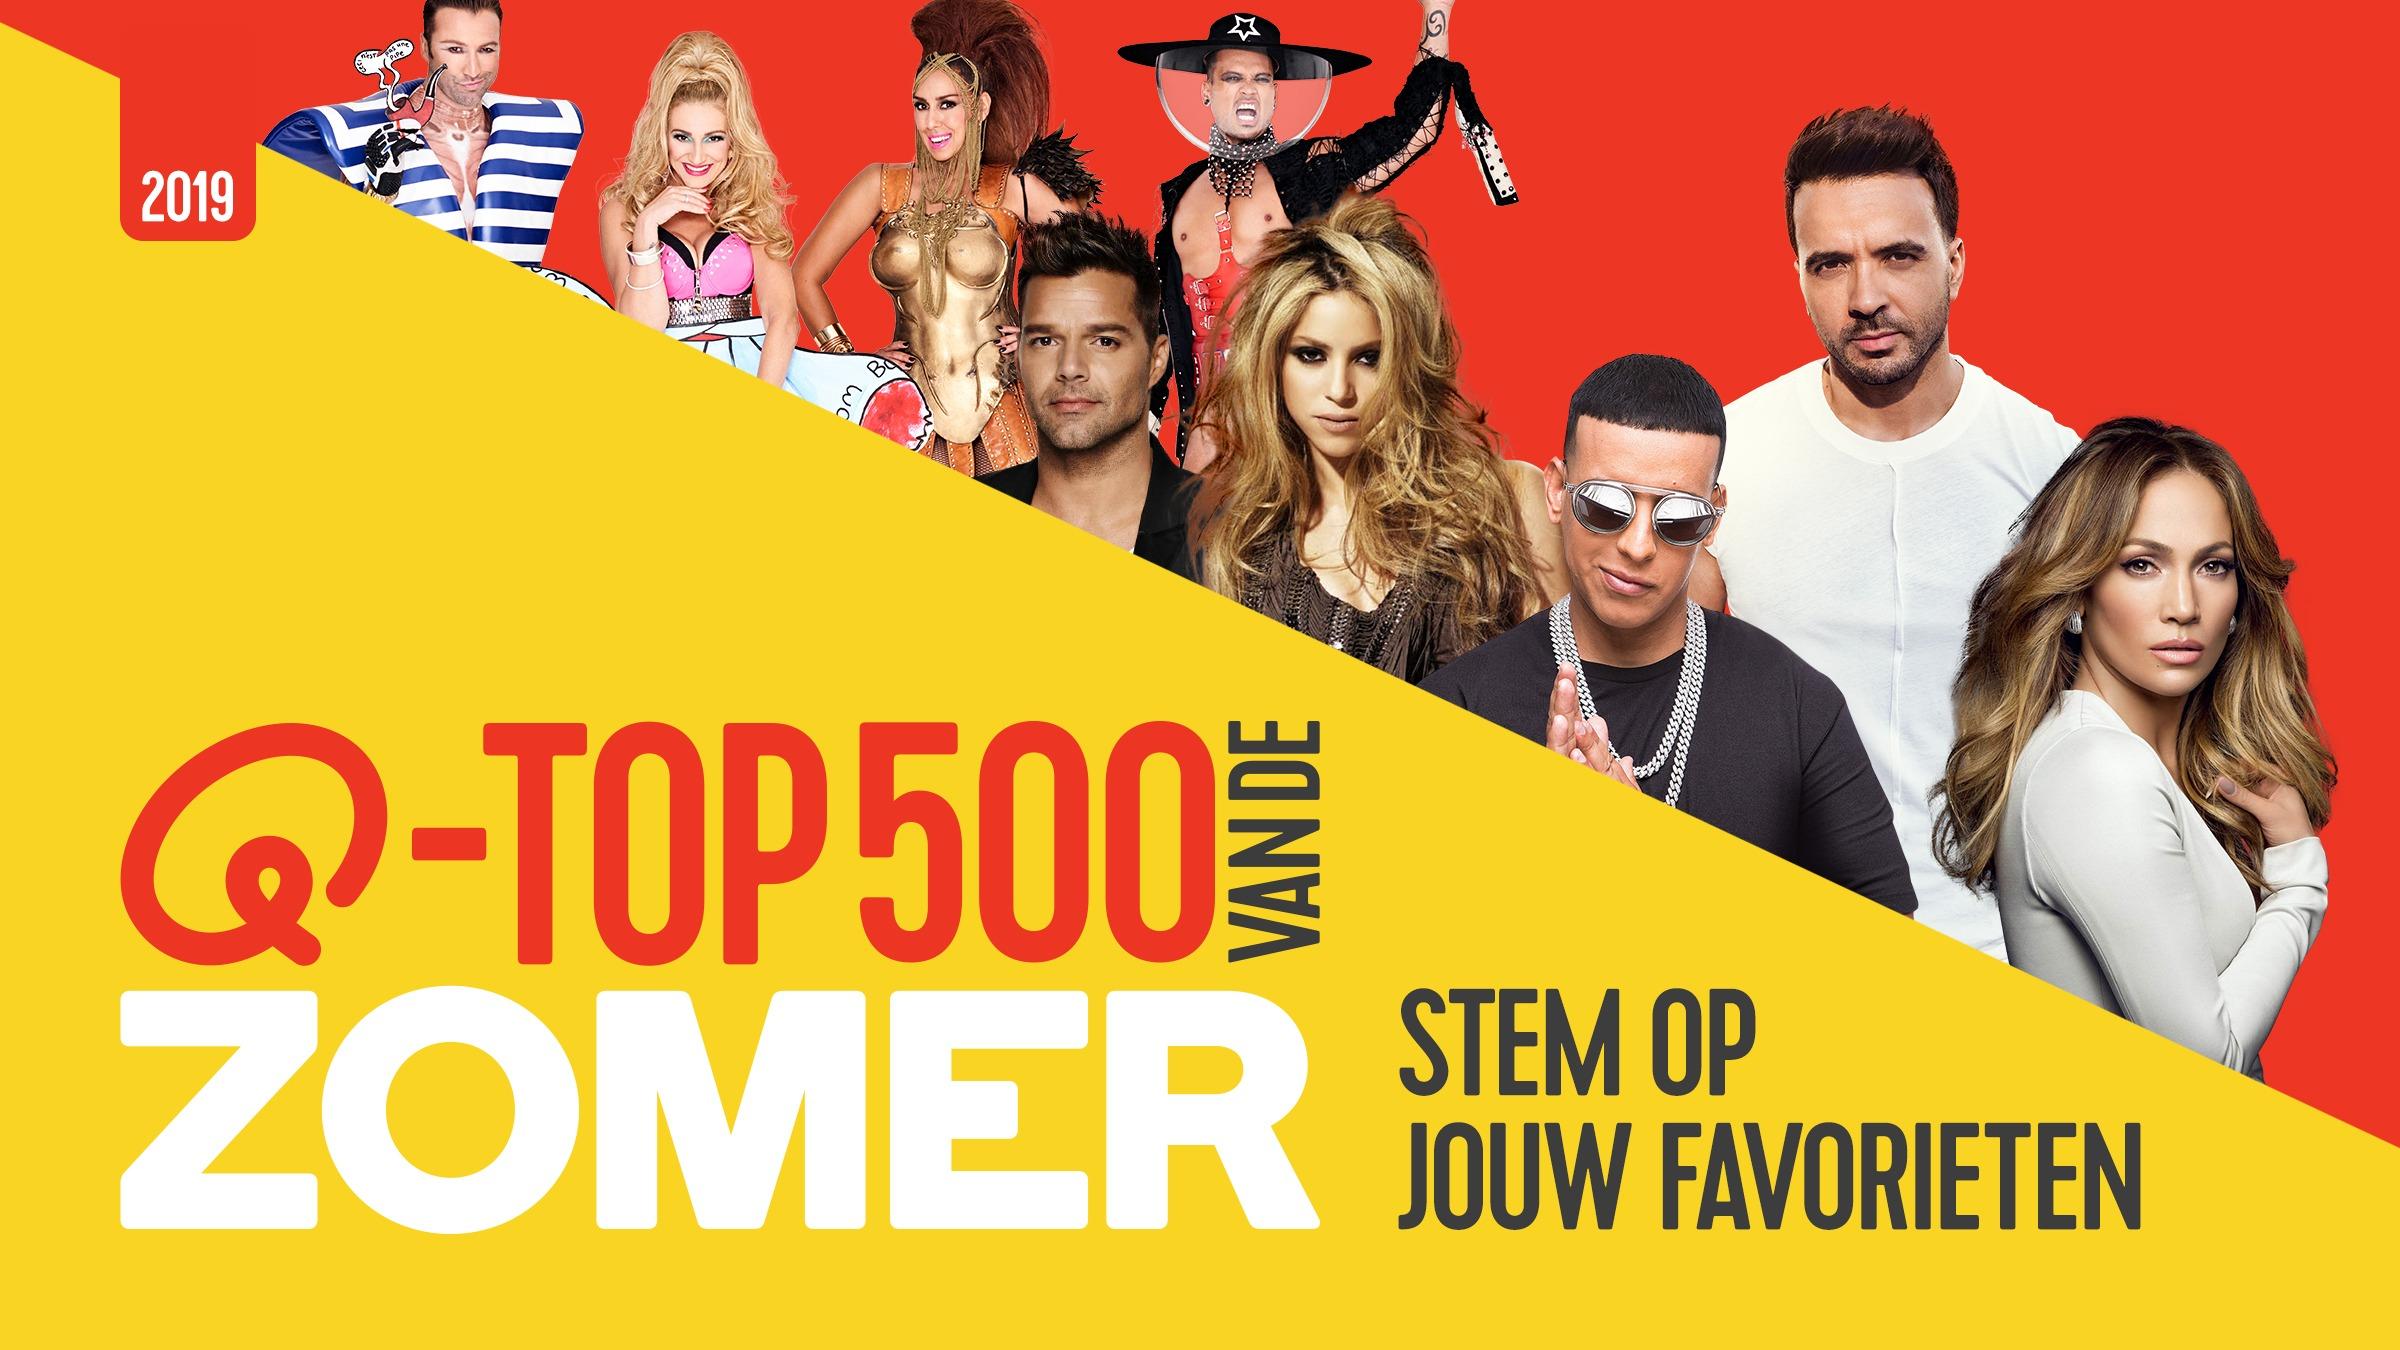 Qmusic teaser top500 zomer 2019 stem